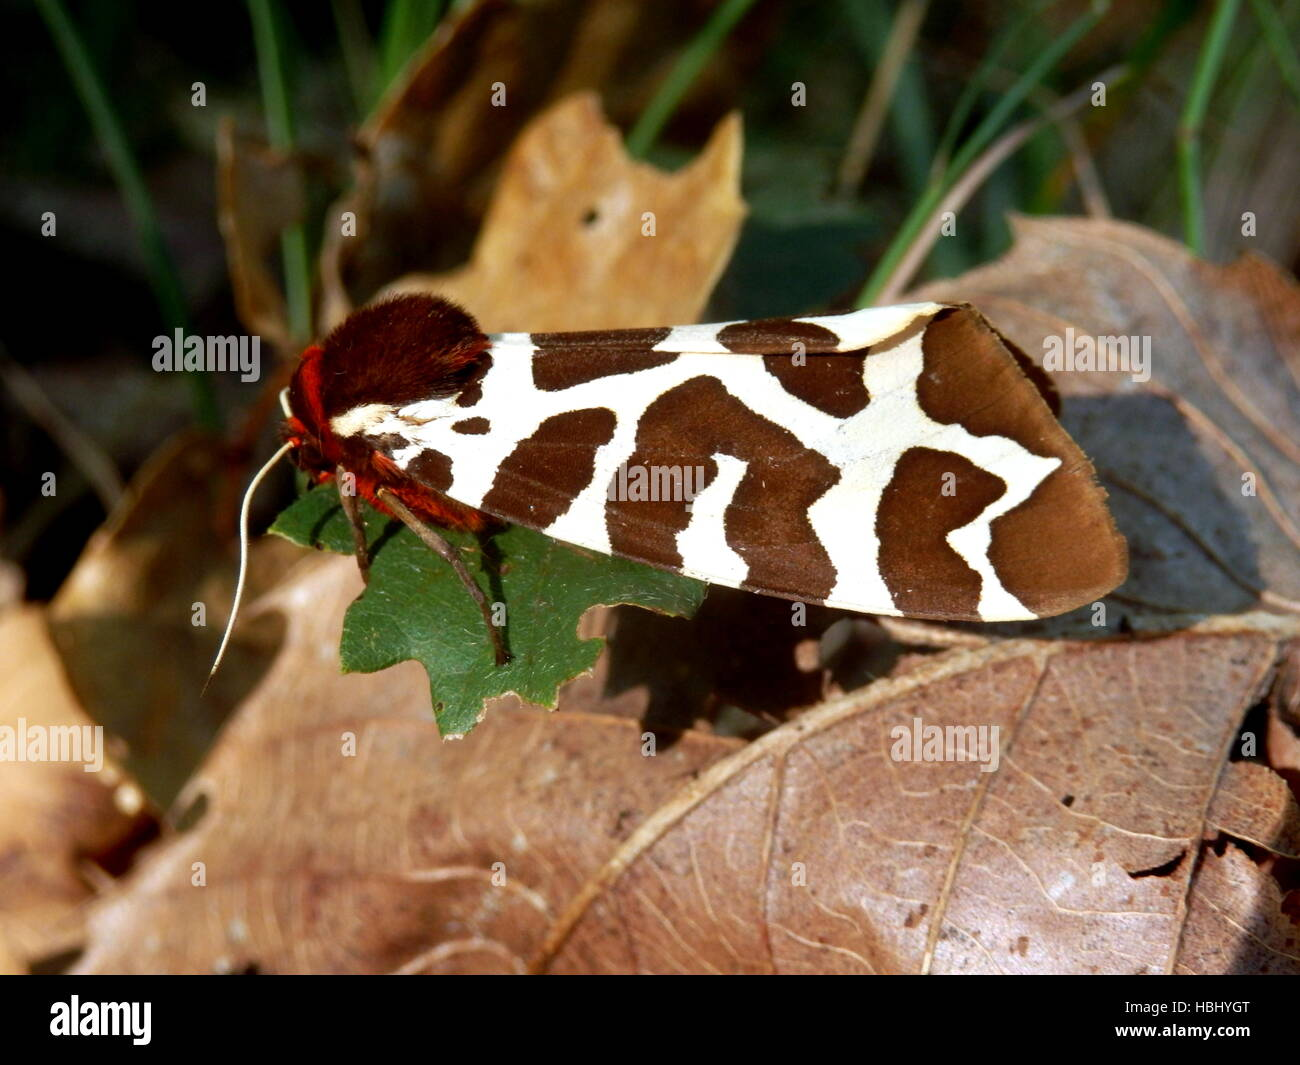 Garden Tiger Moth Stock Photo: 127628616 - Alamy